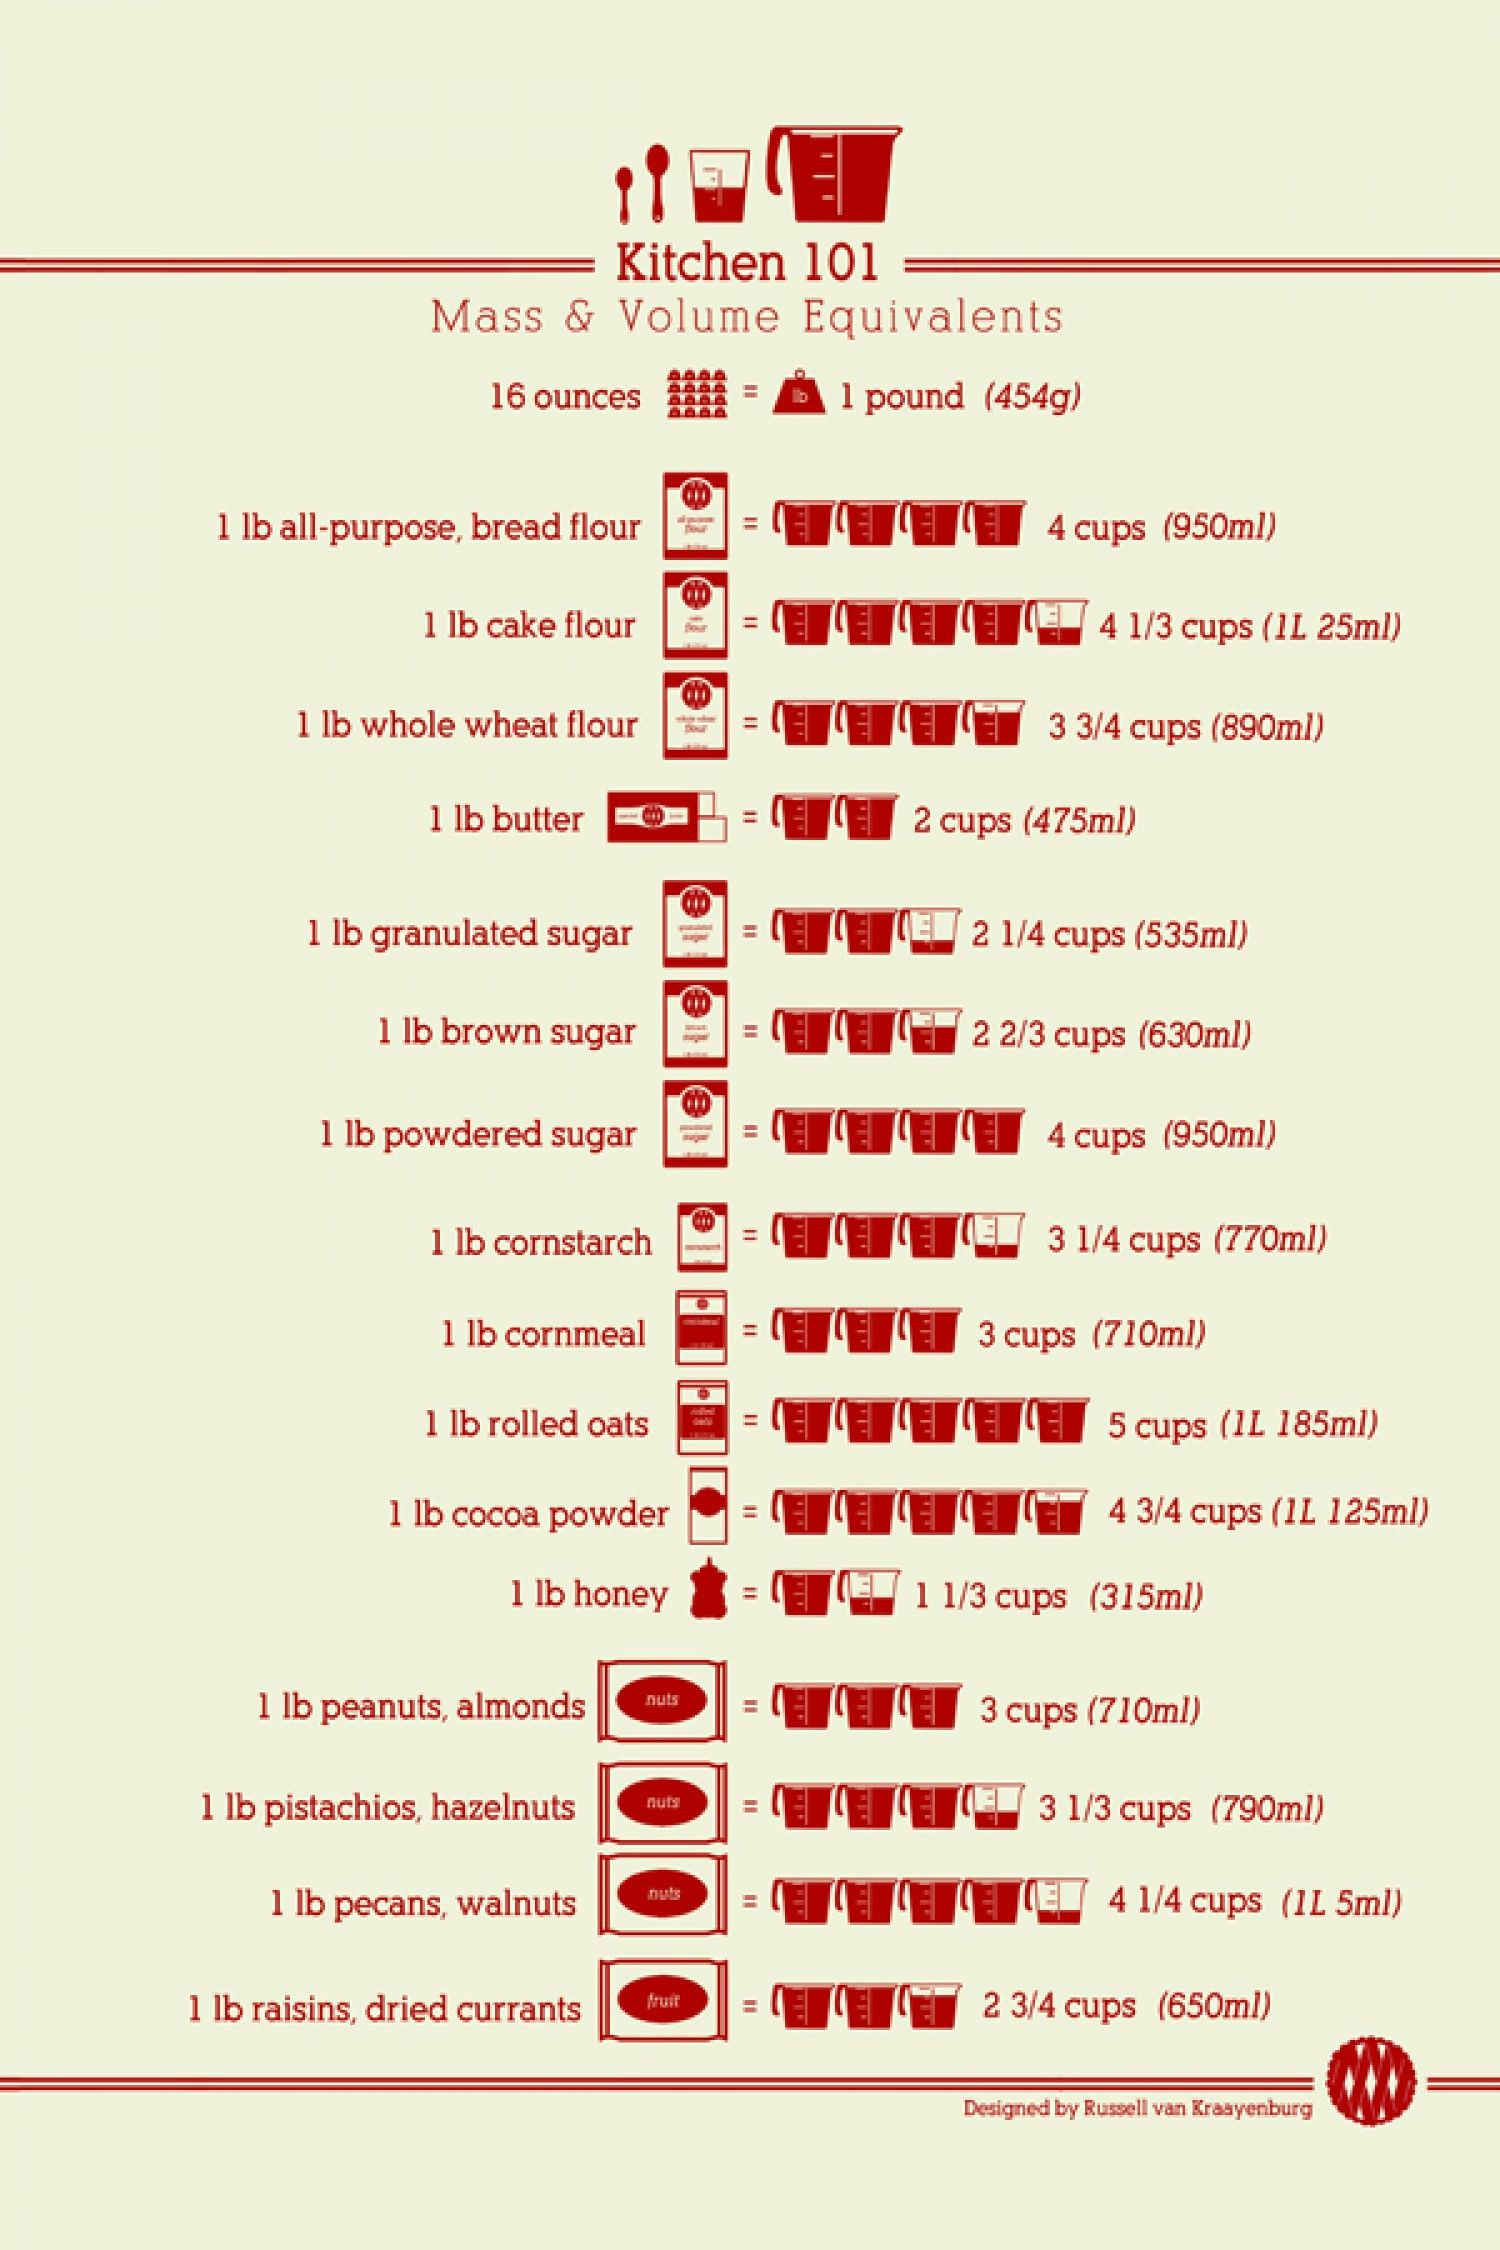 Kitchen 101 Mass Amp Volume Equivalents Infographic